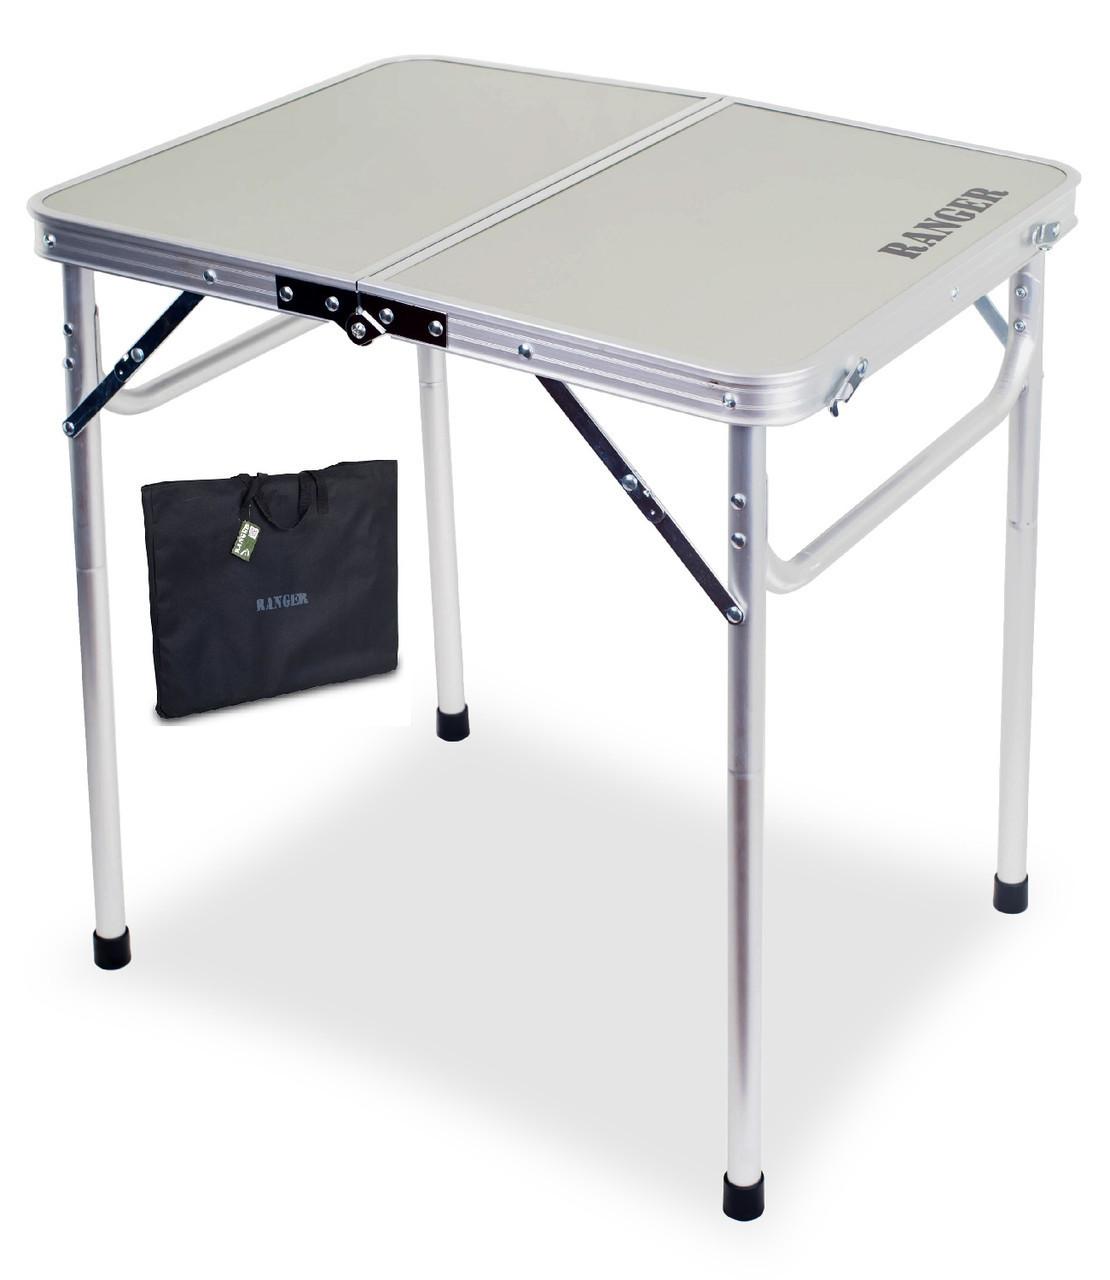 Стол складной Ranger Slim RA 1109